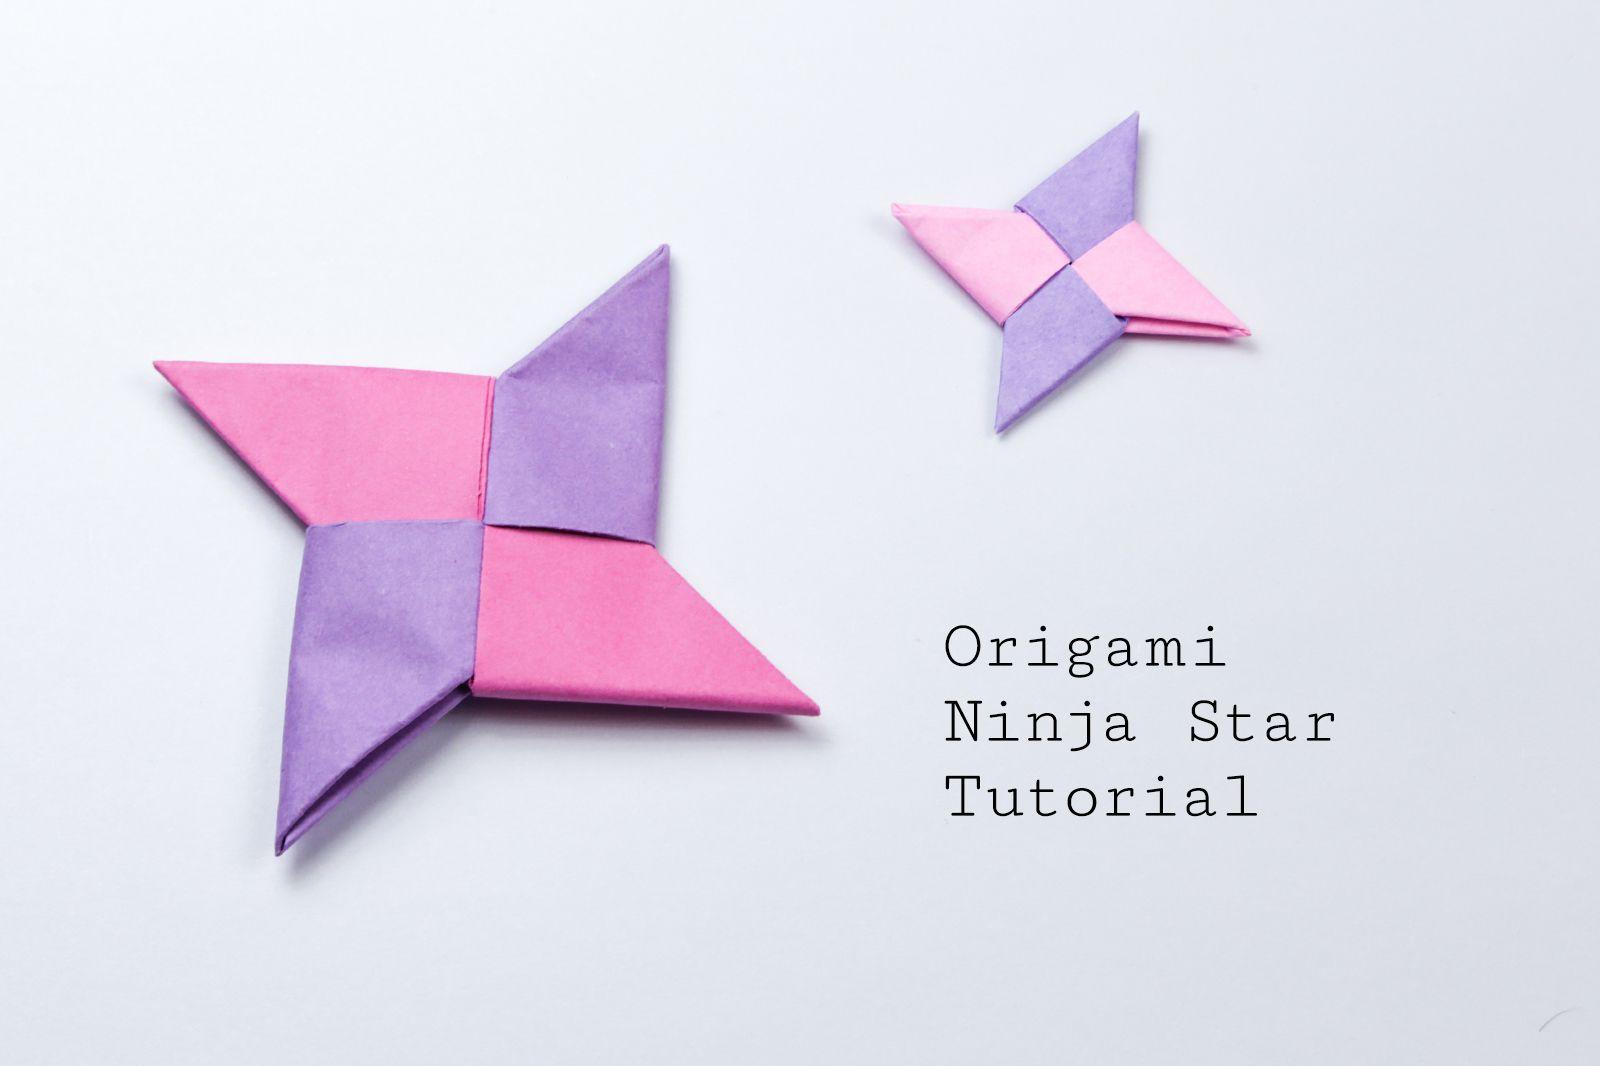 Origami Ninja Star Tutorial - photo#32